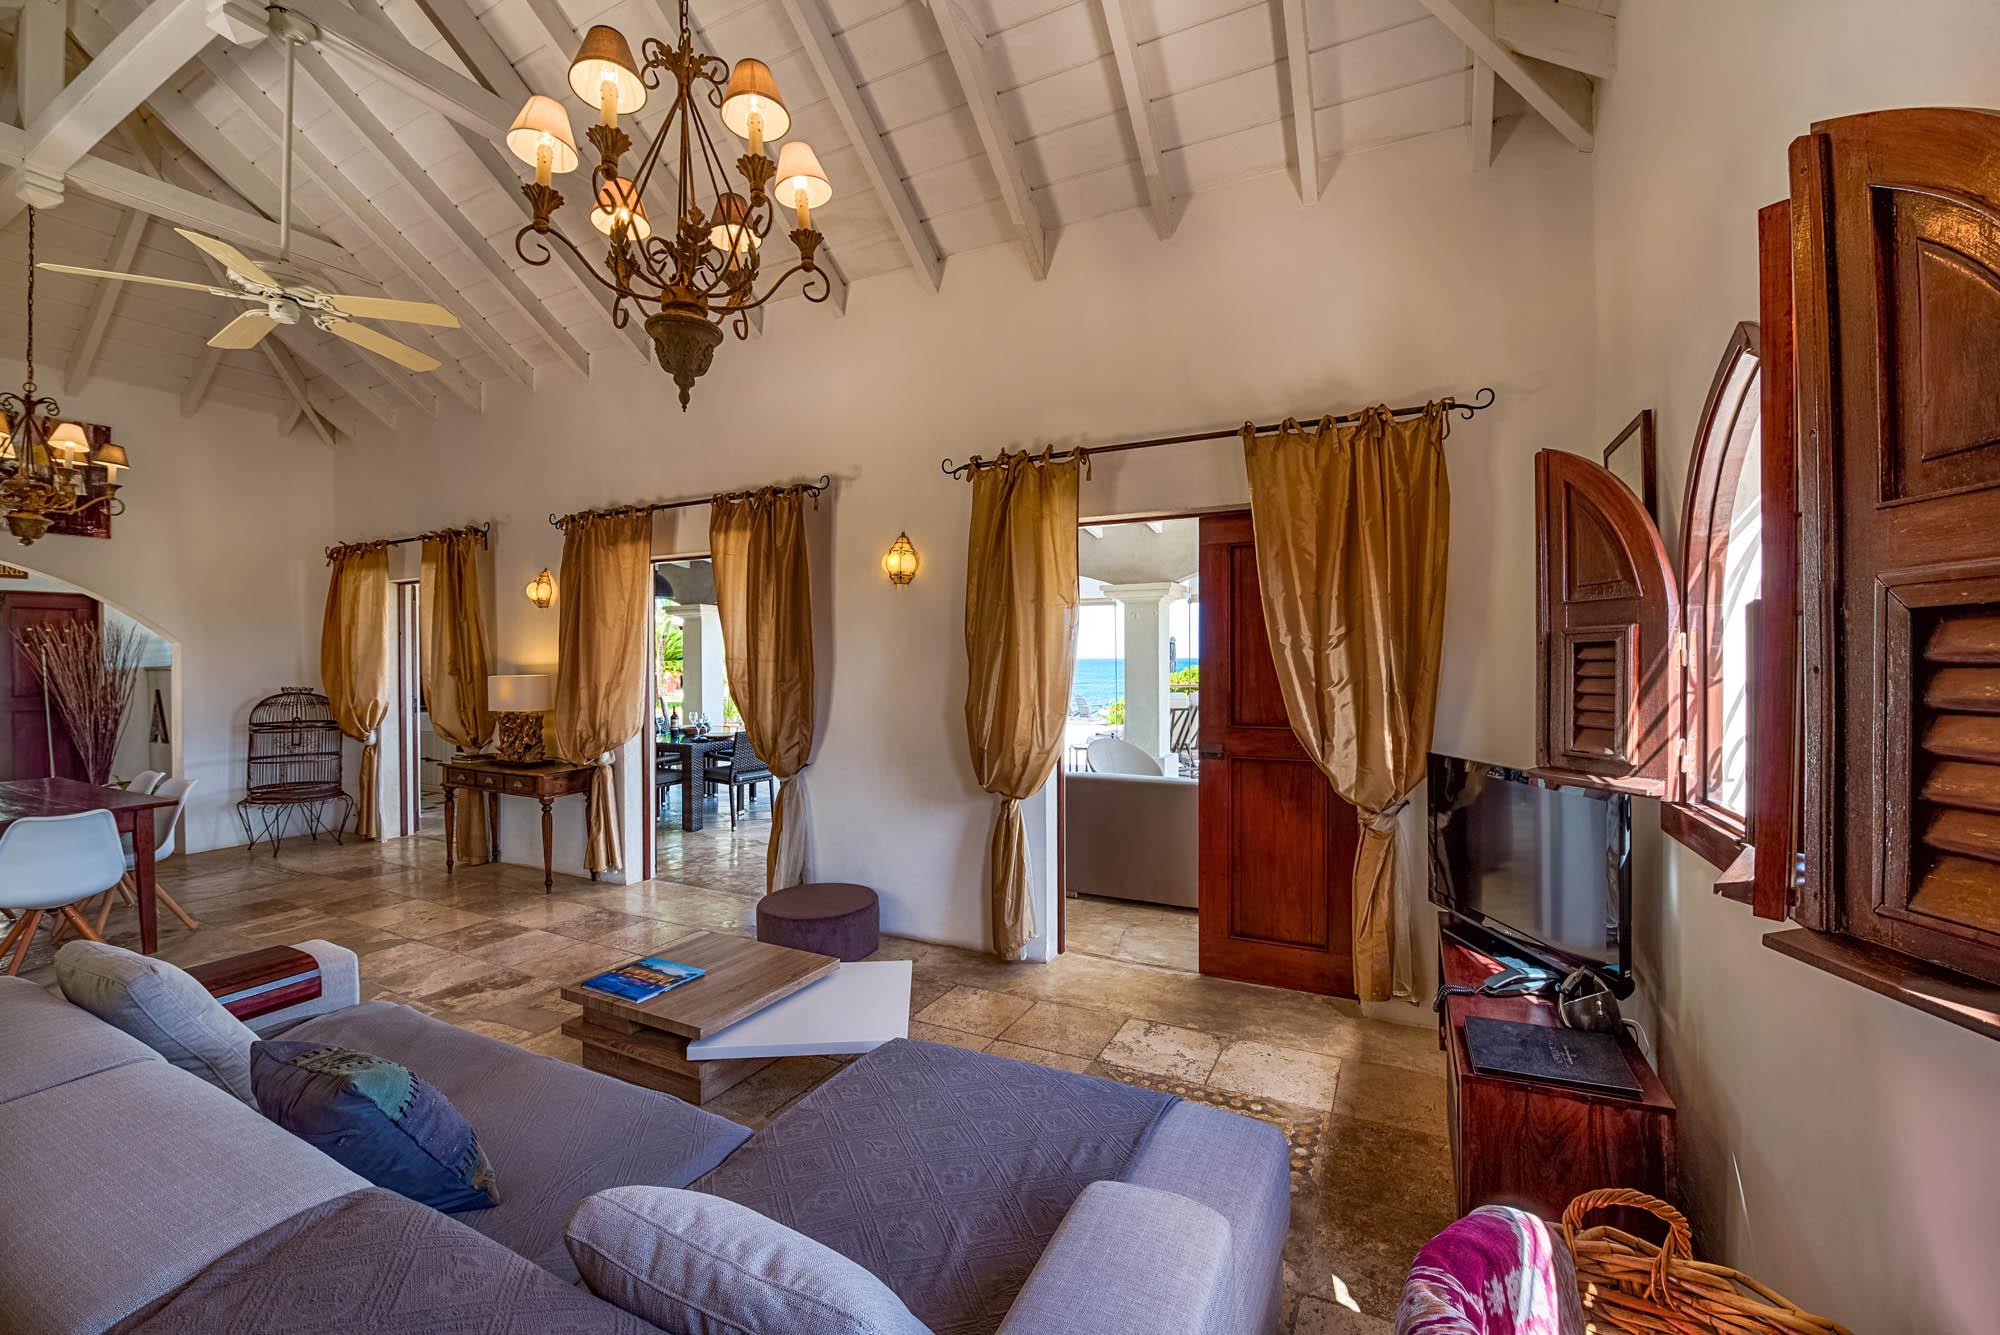 The classy living room of Le Mas des Sables villa rental, Baie aux Cayes, Terres Basses, Saint Martin, Caribbean.